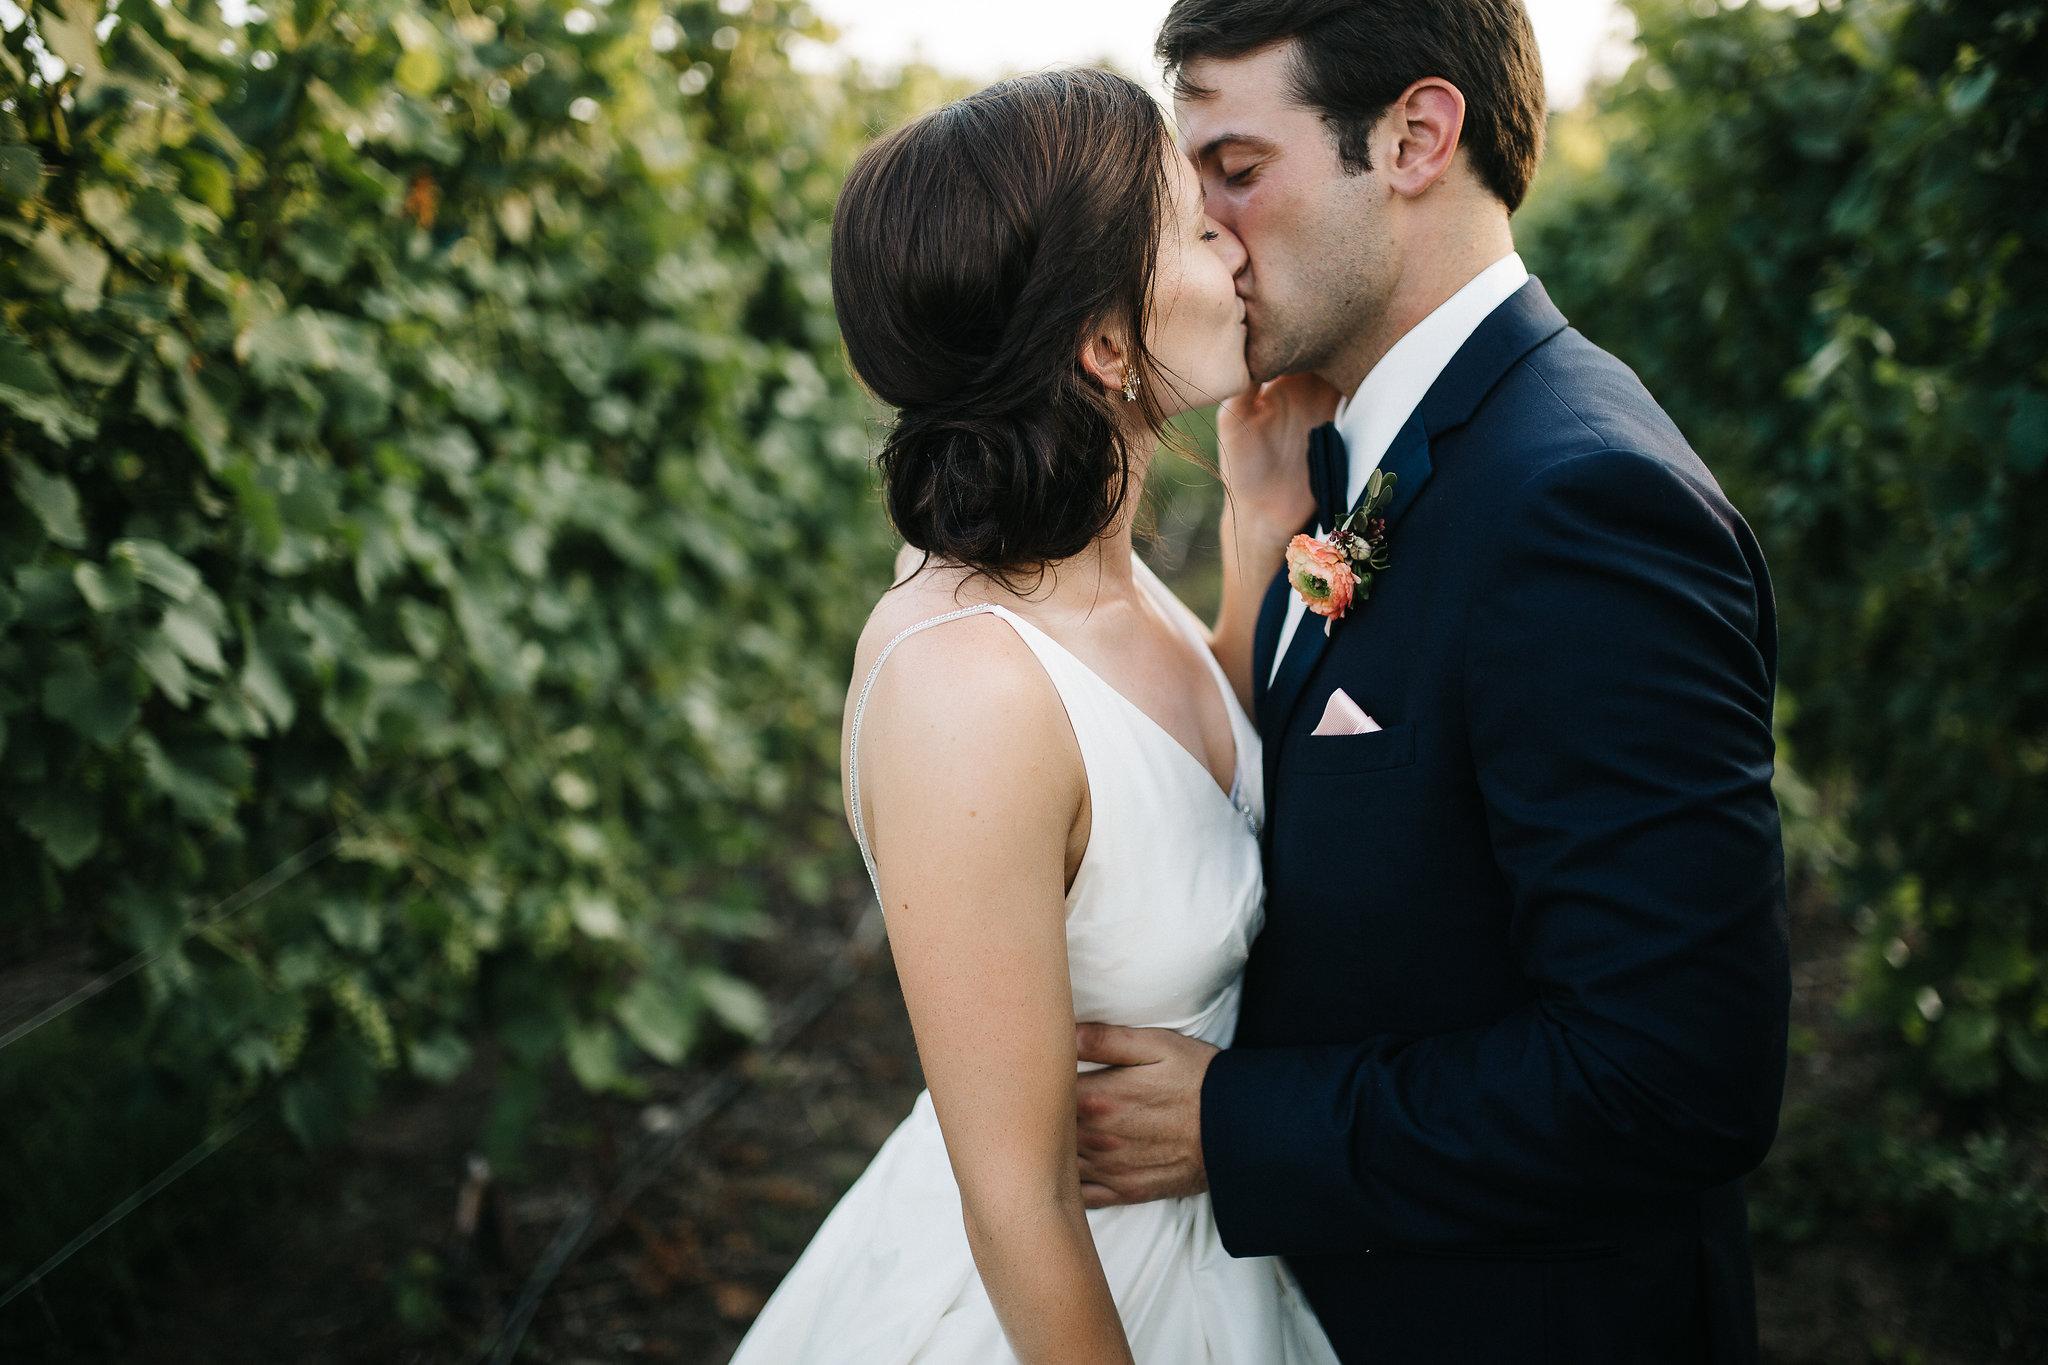 BrideGroom-MeganPatrick-57.jpg